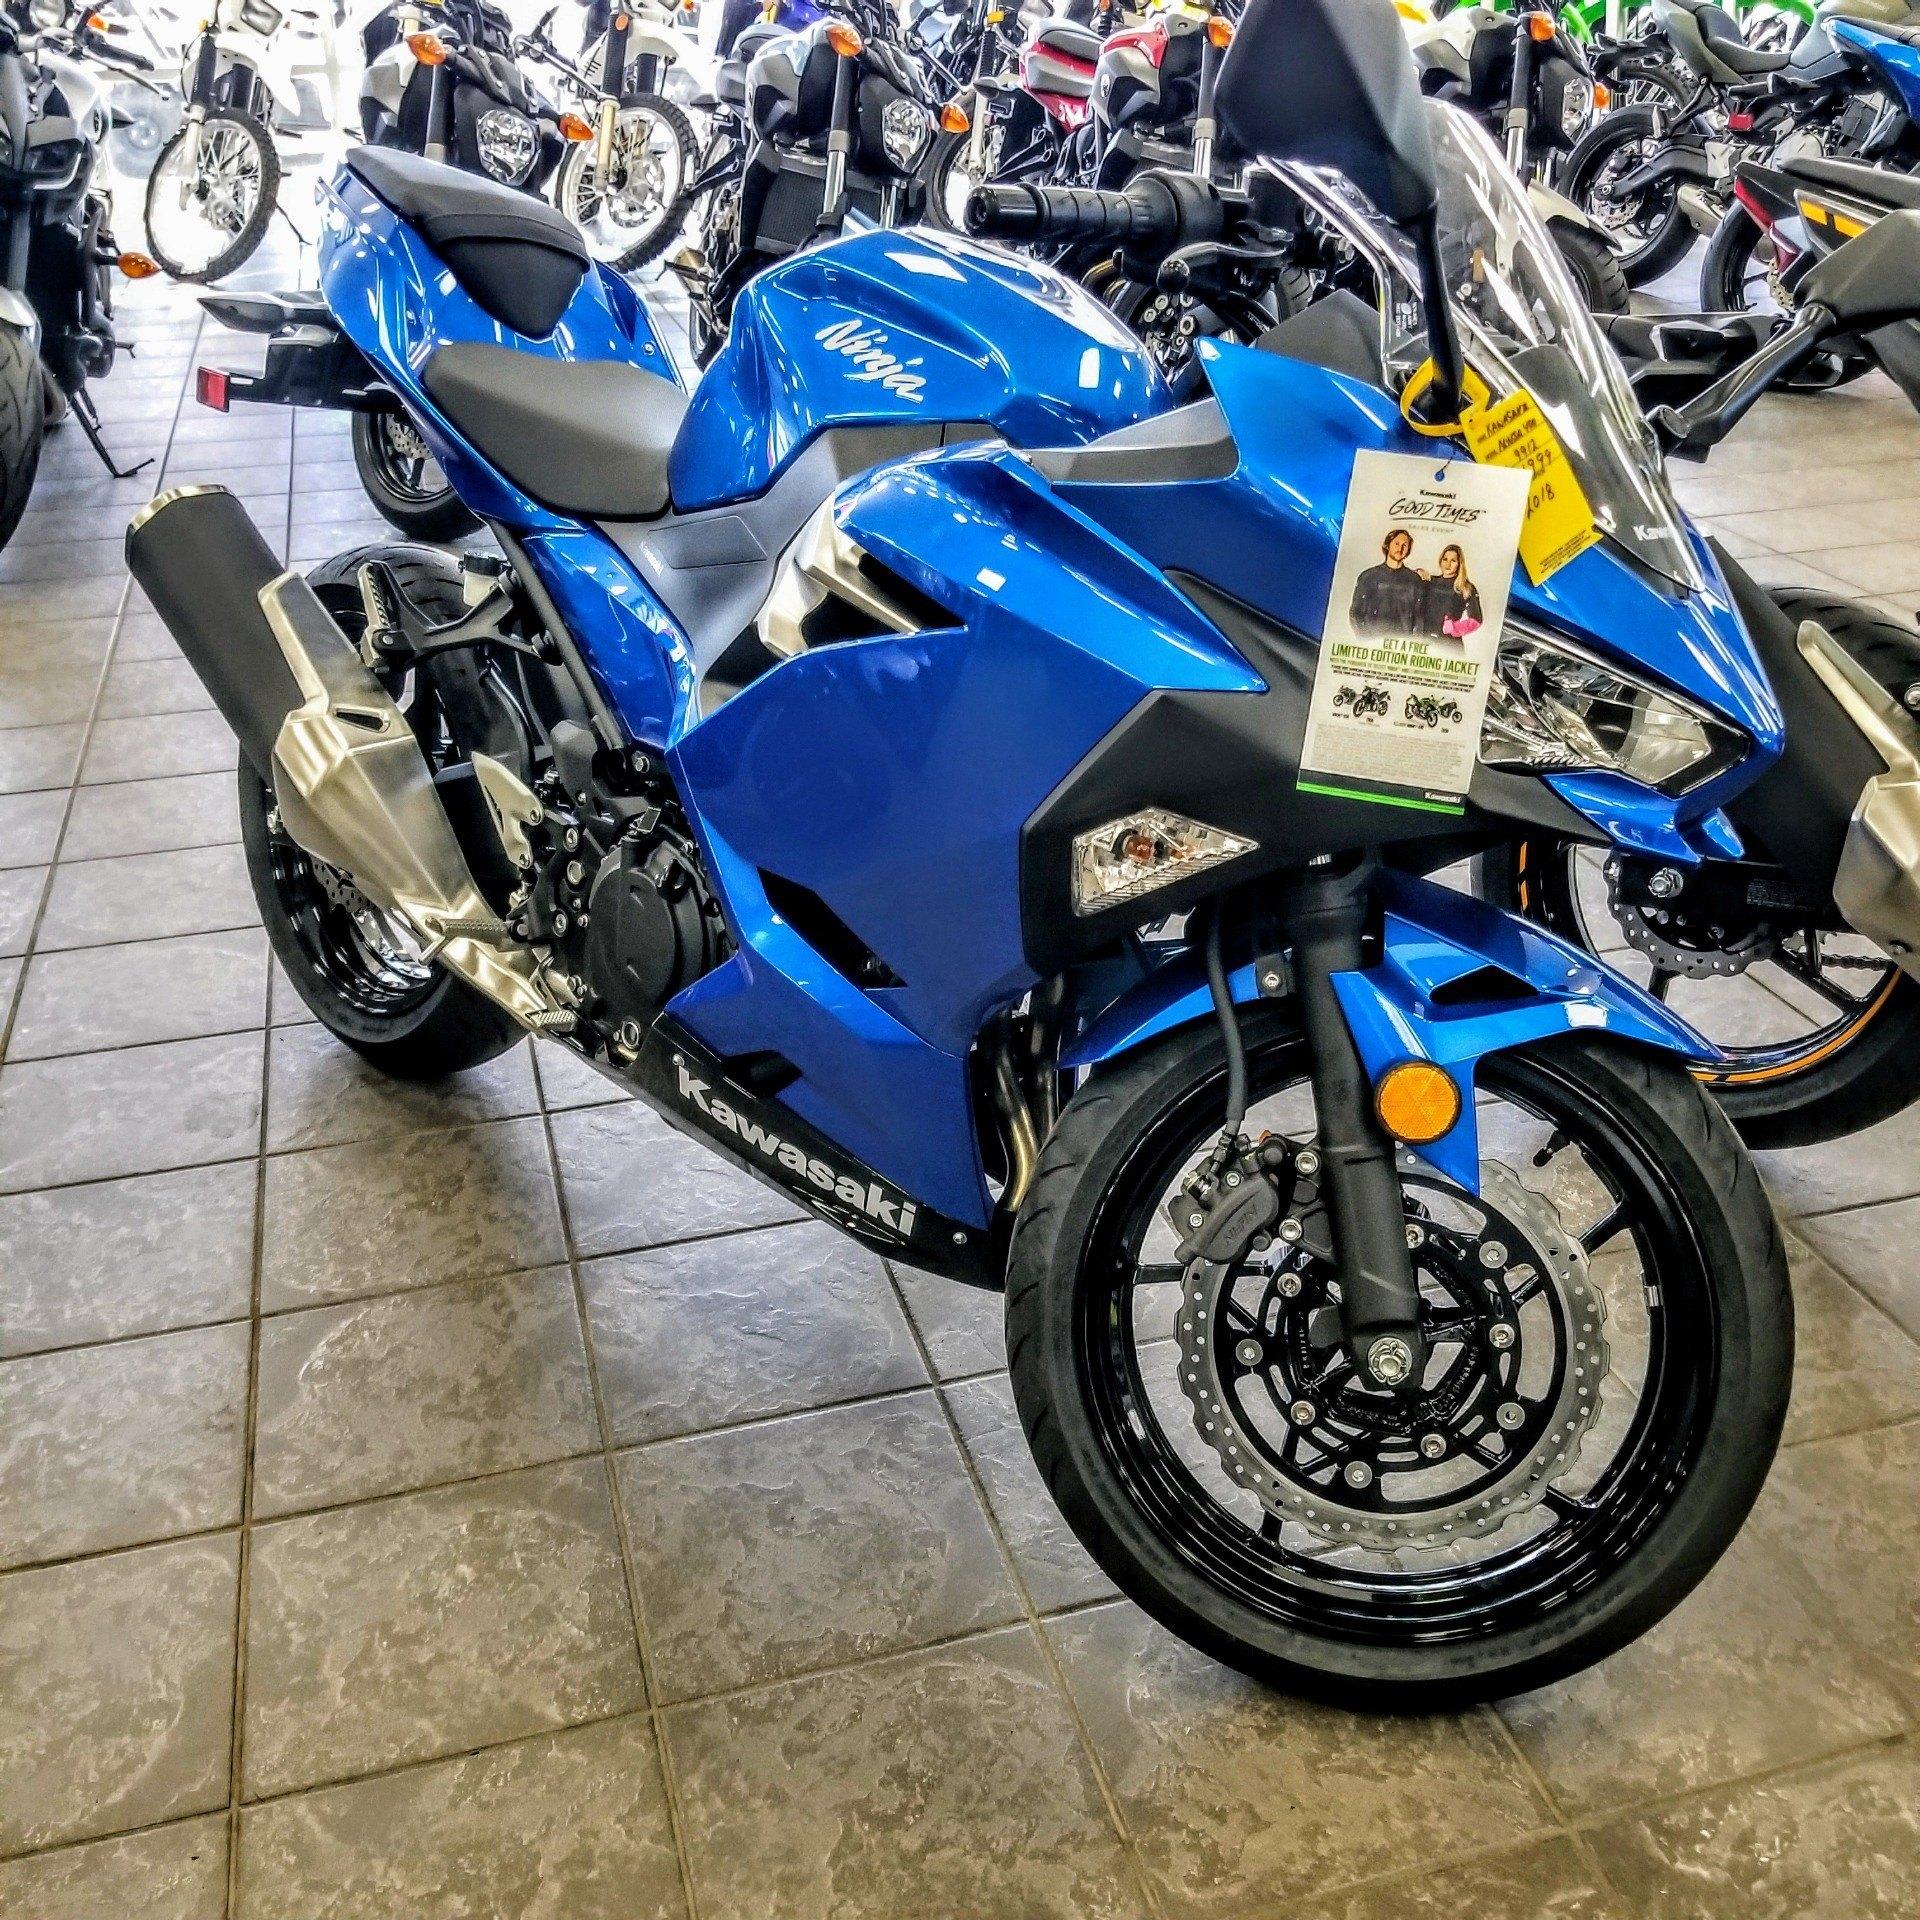 New 2018 Kawasaki Ninja 400 Motorcycles In Hickory Nc Stock